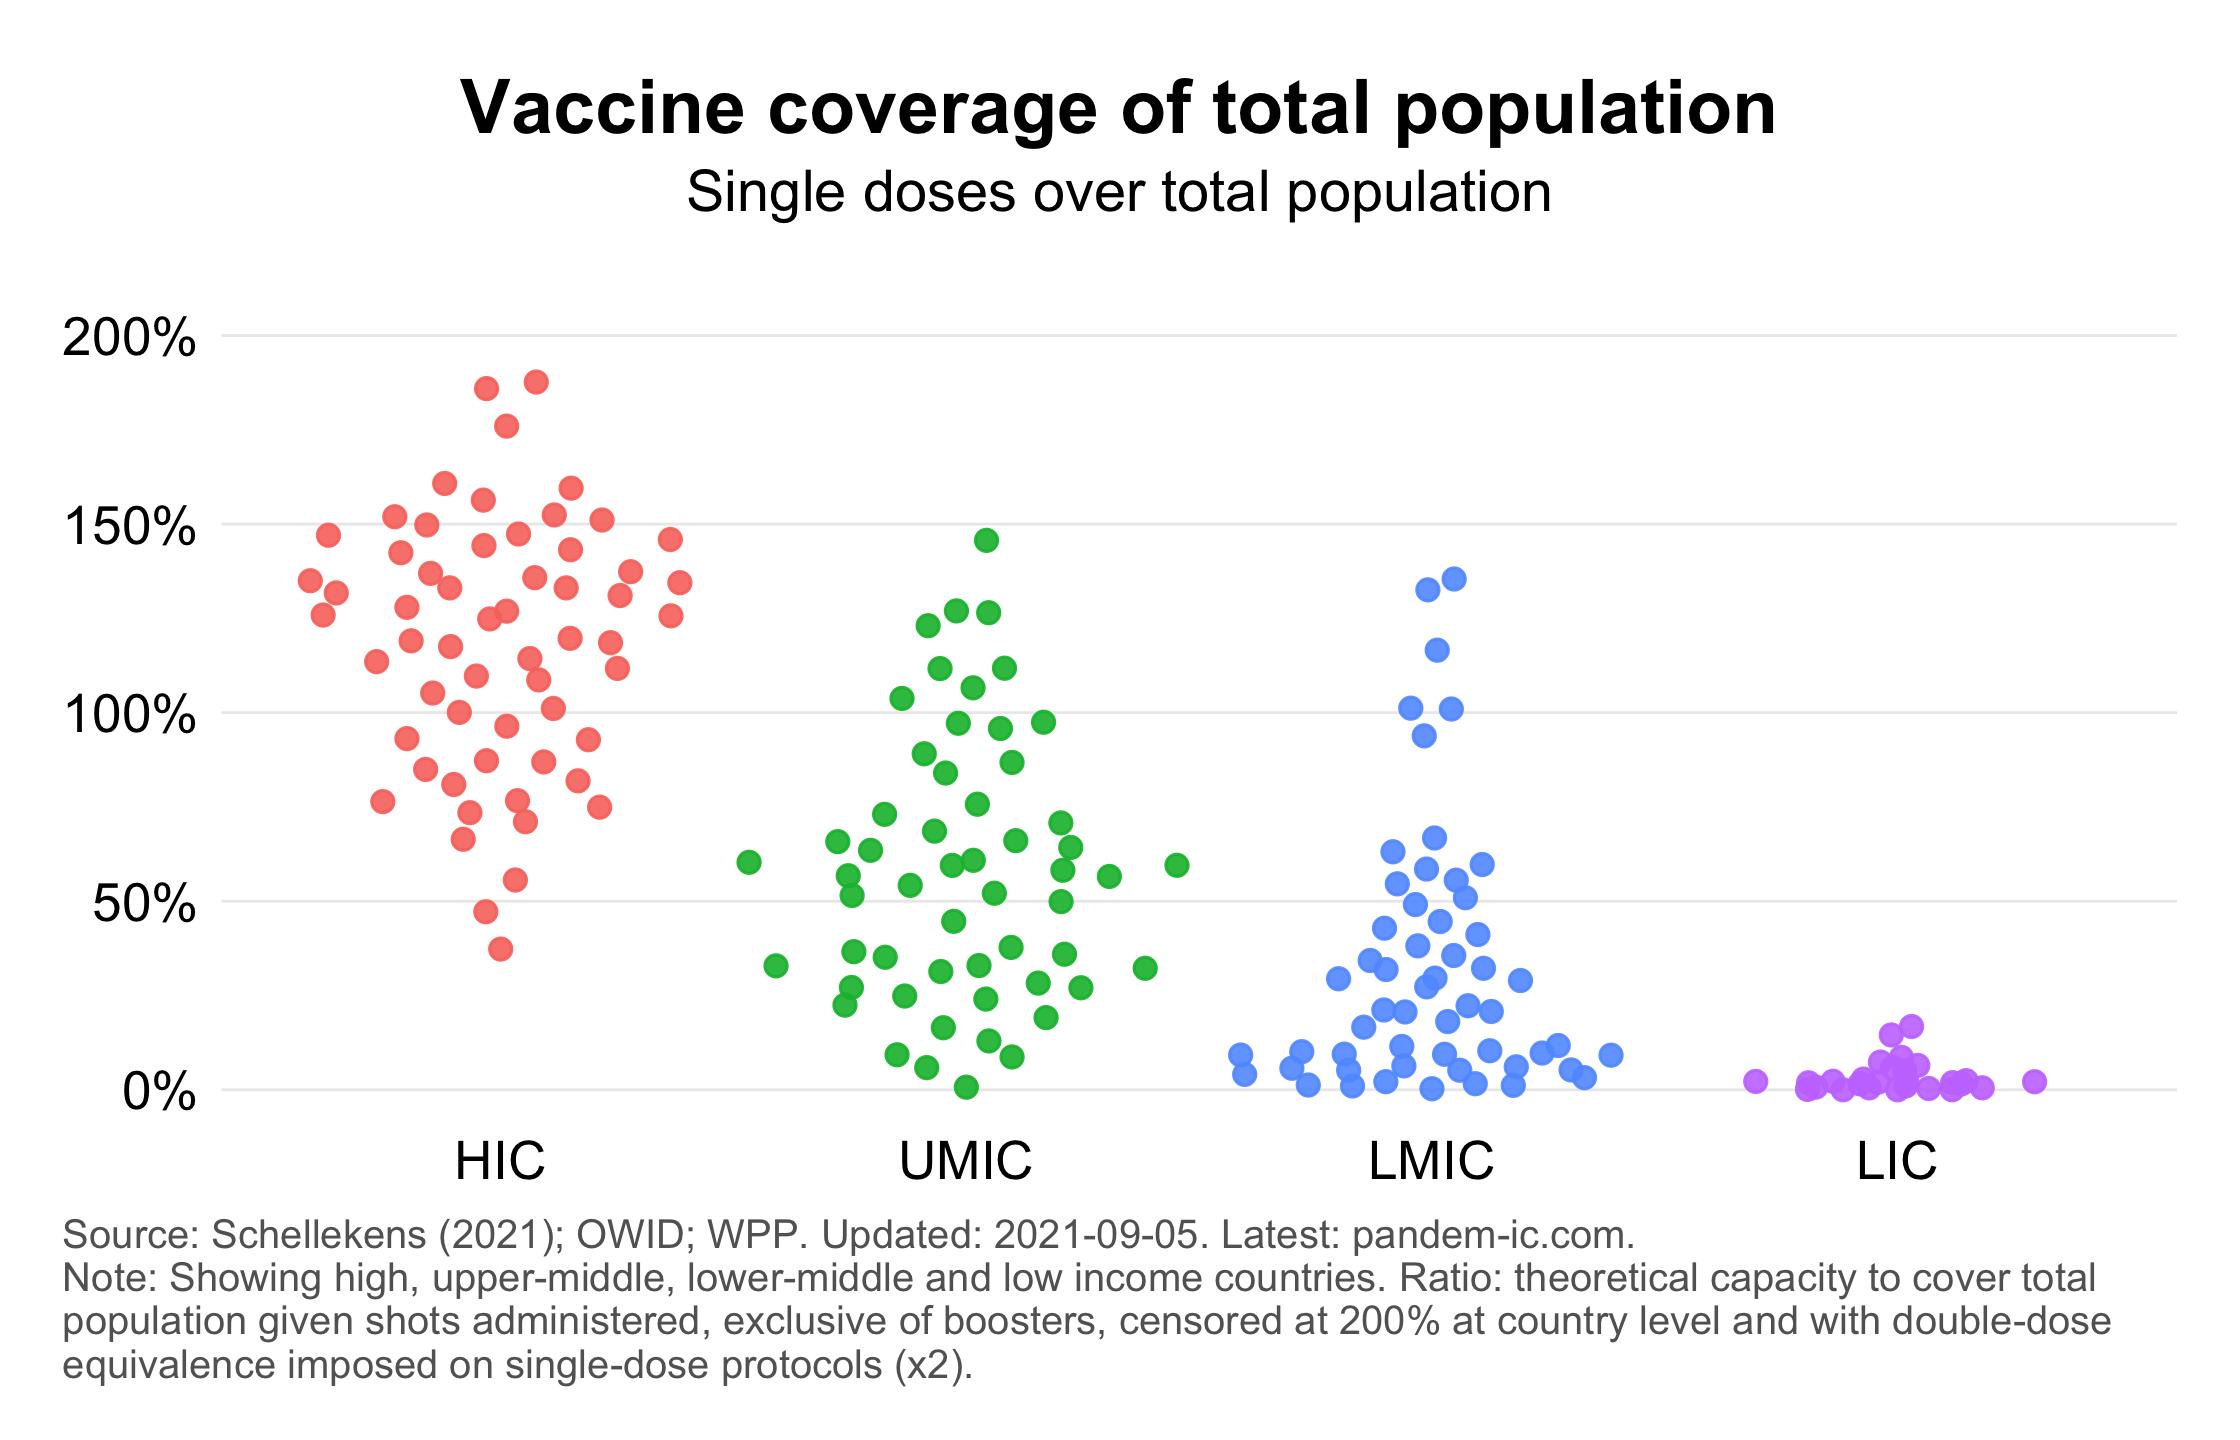 Single-shot coverage of total population